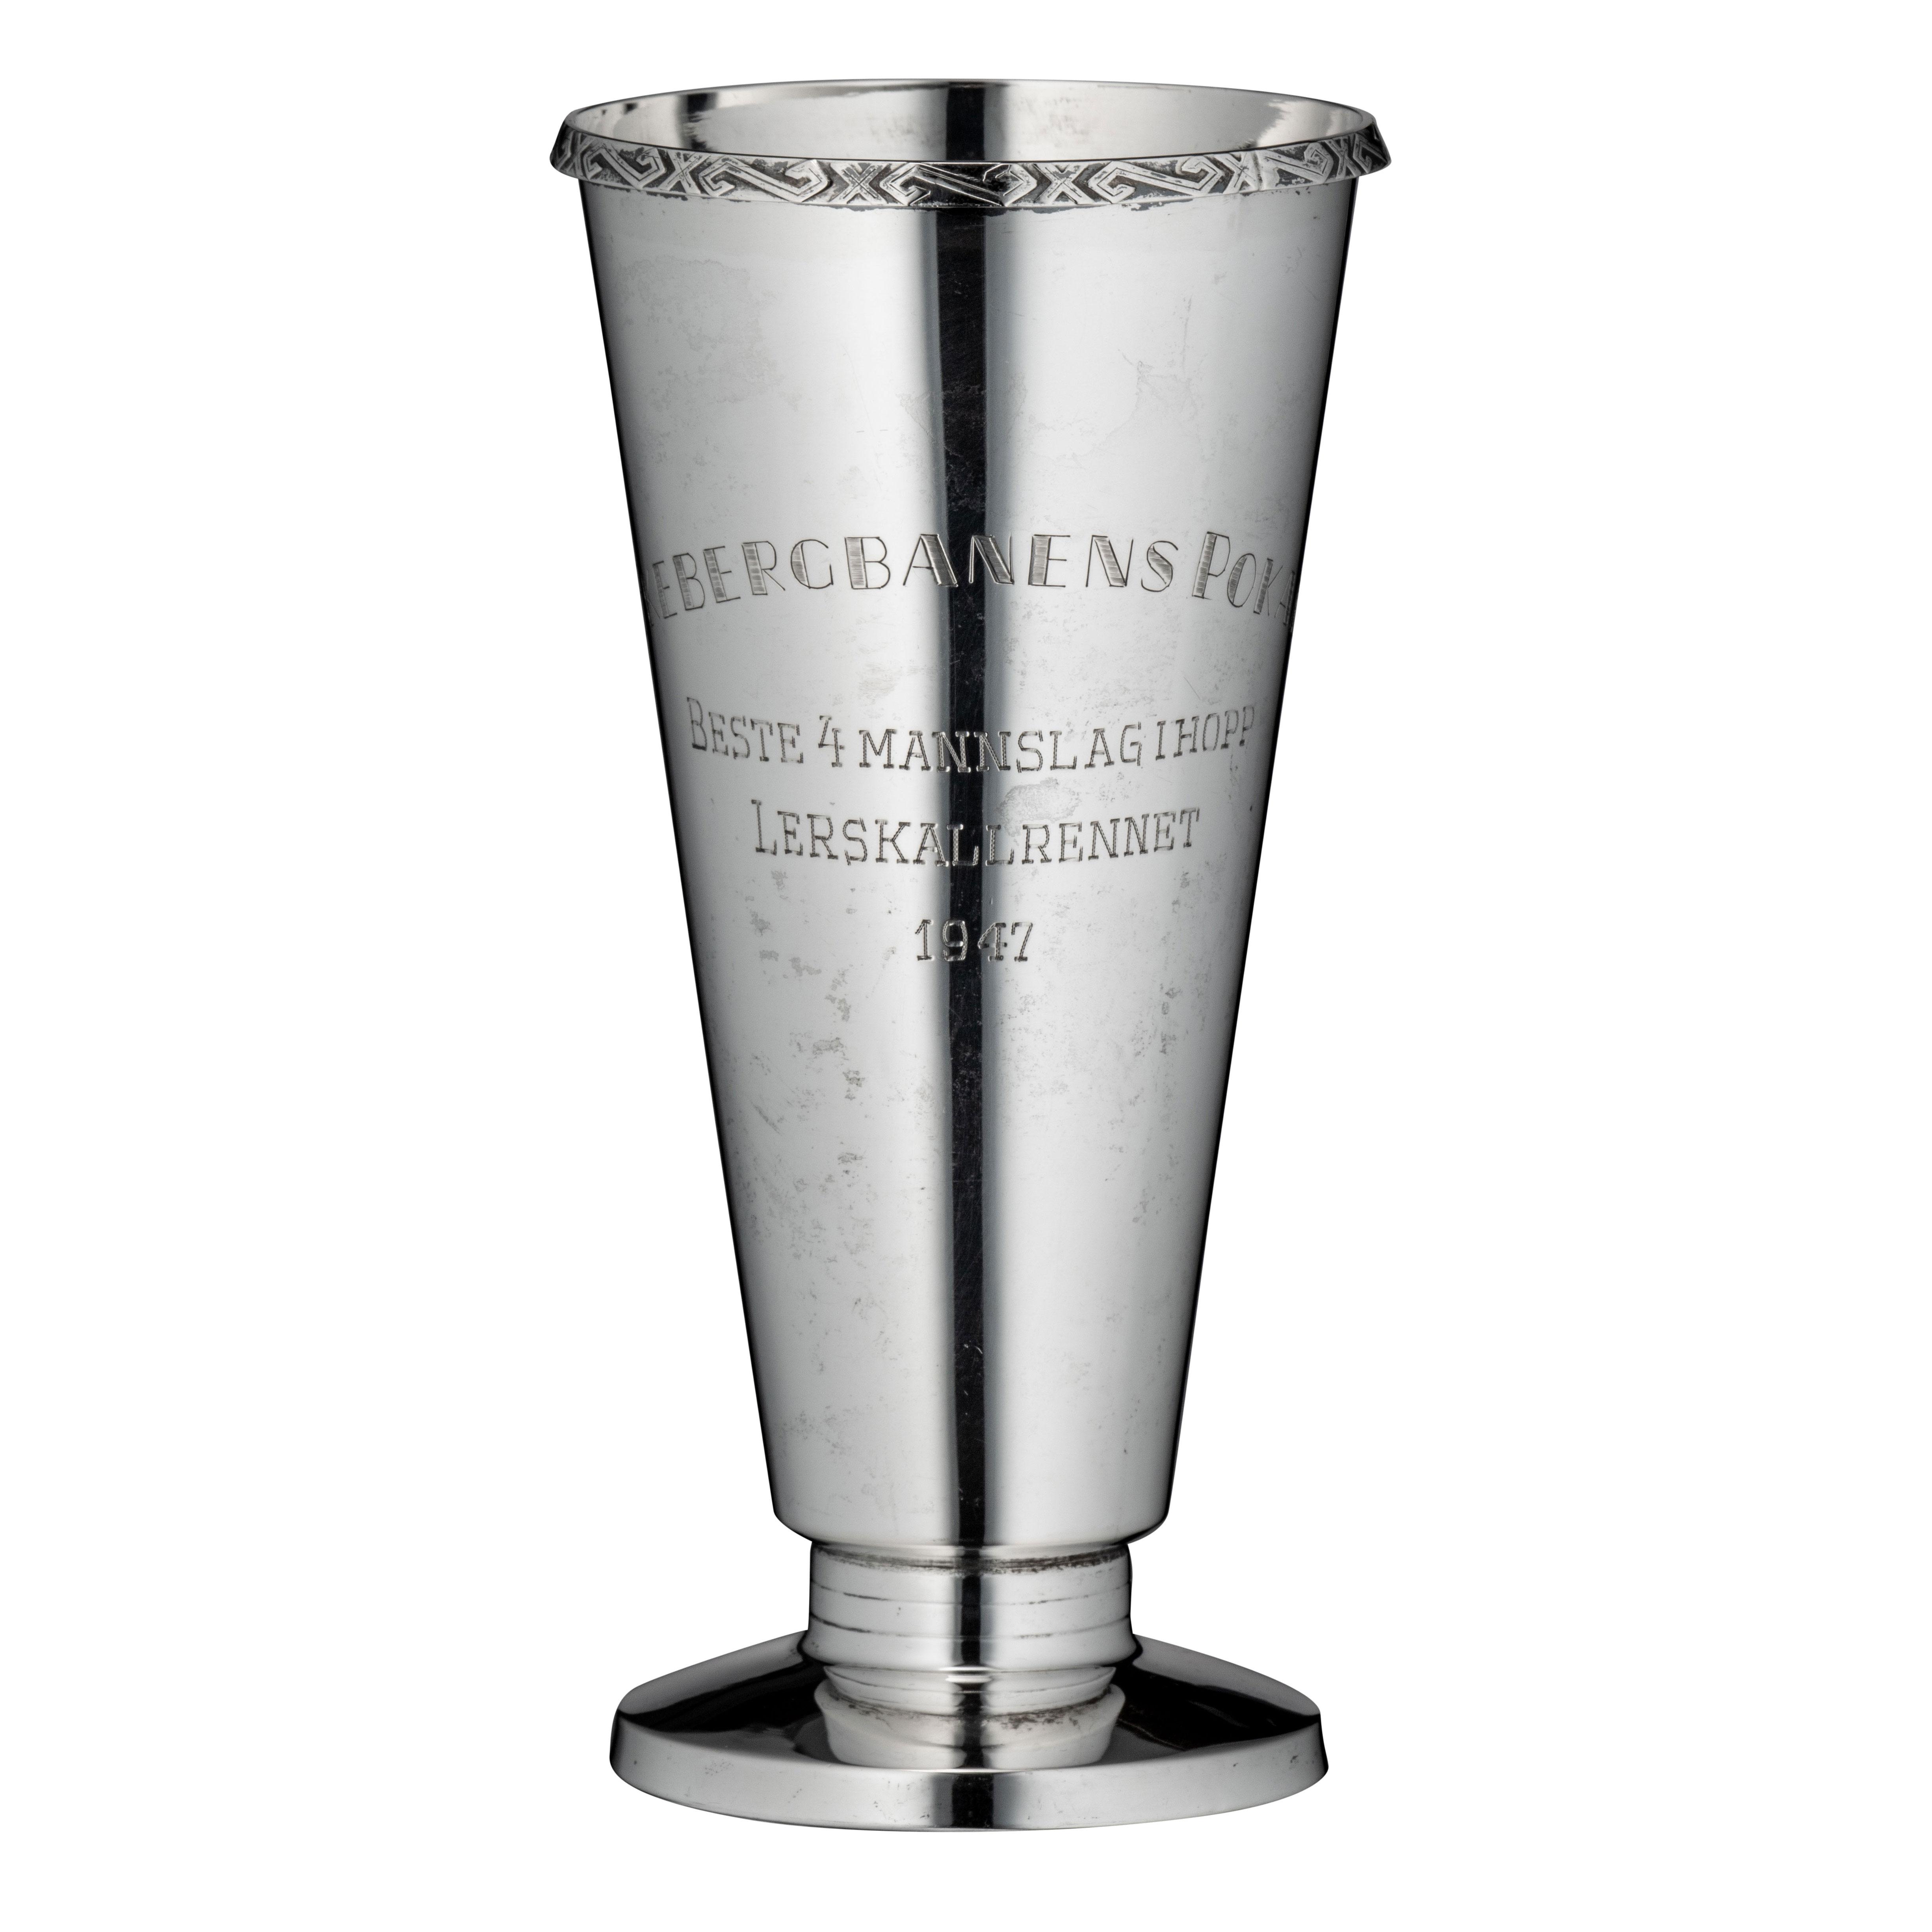 Ekebergbanens Pokal